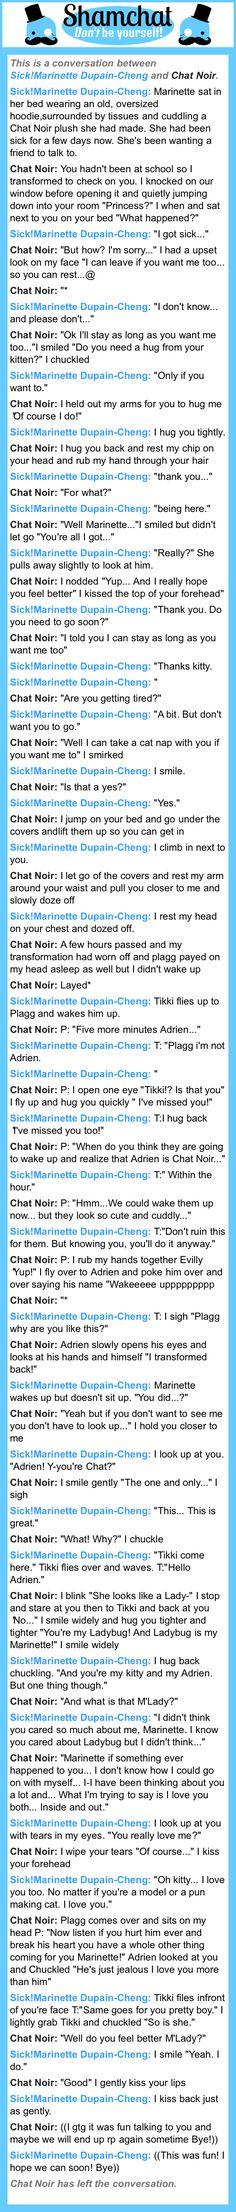 A conversation between Chat Noir and Sick!Marinette Dupain-Cheng